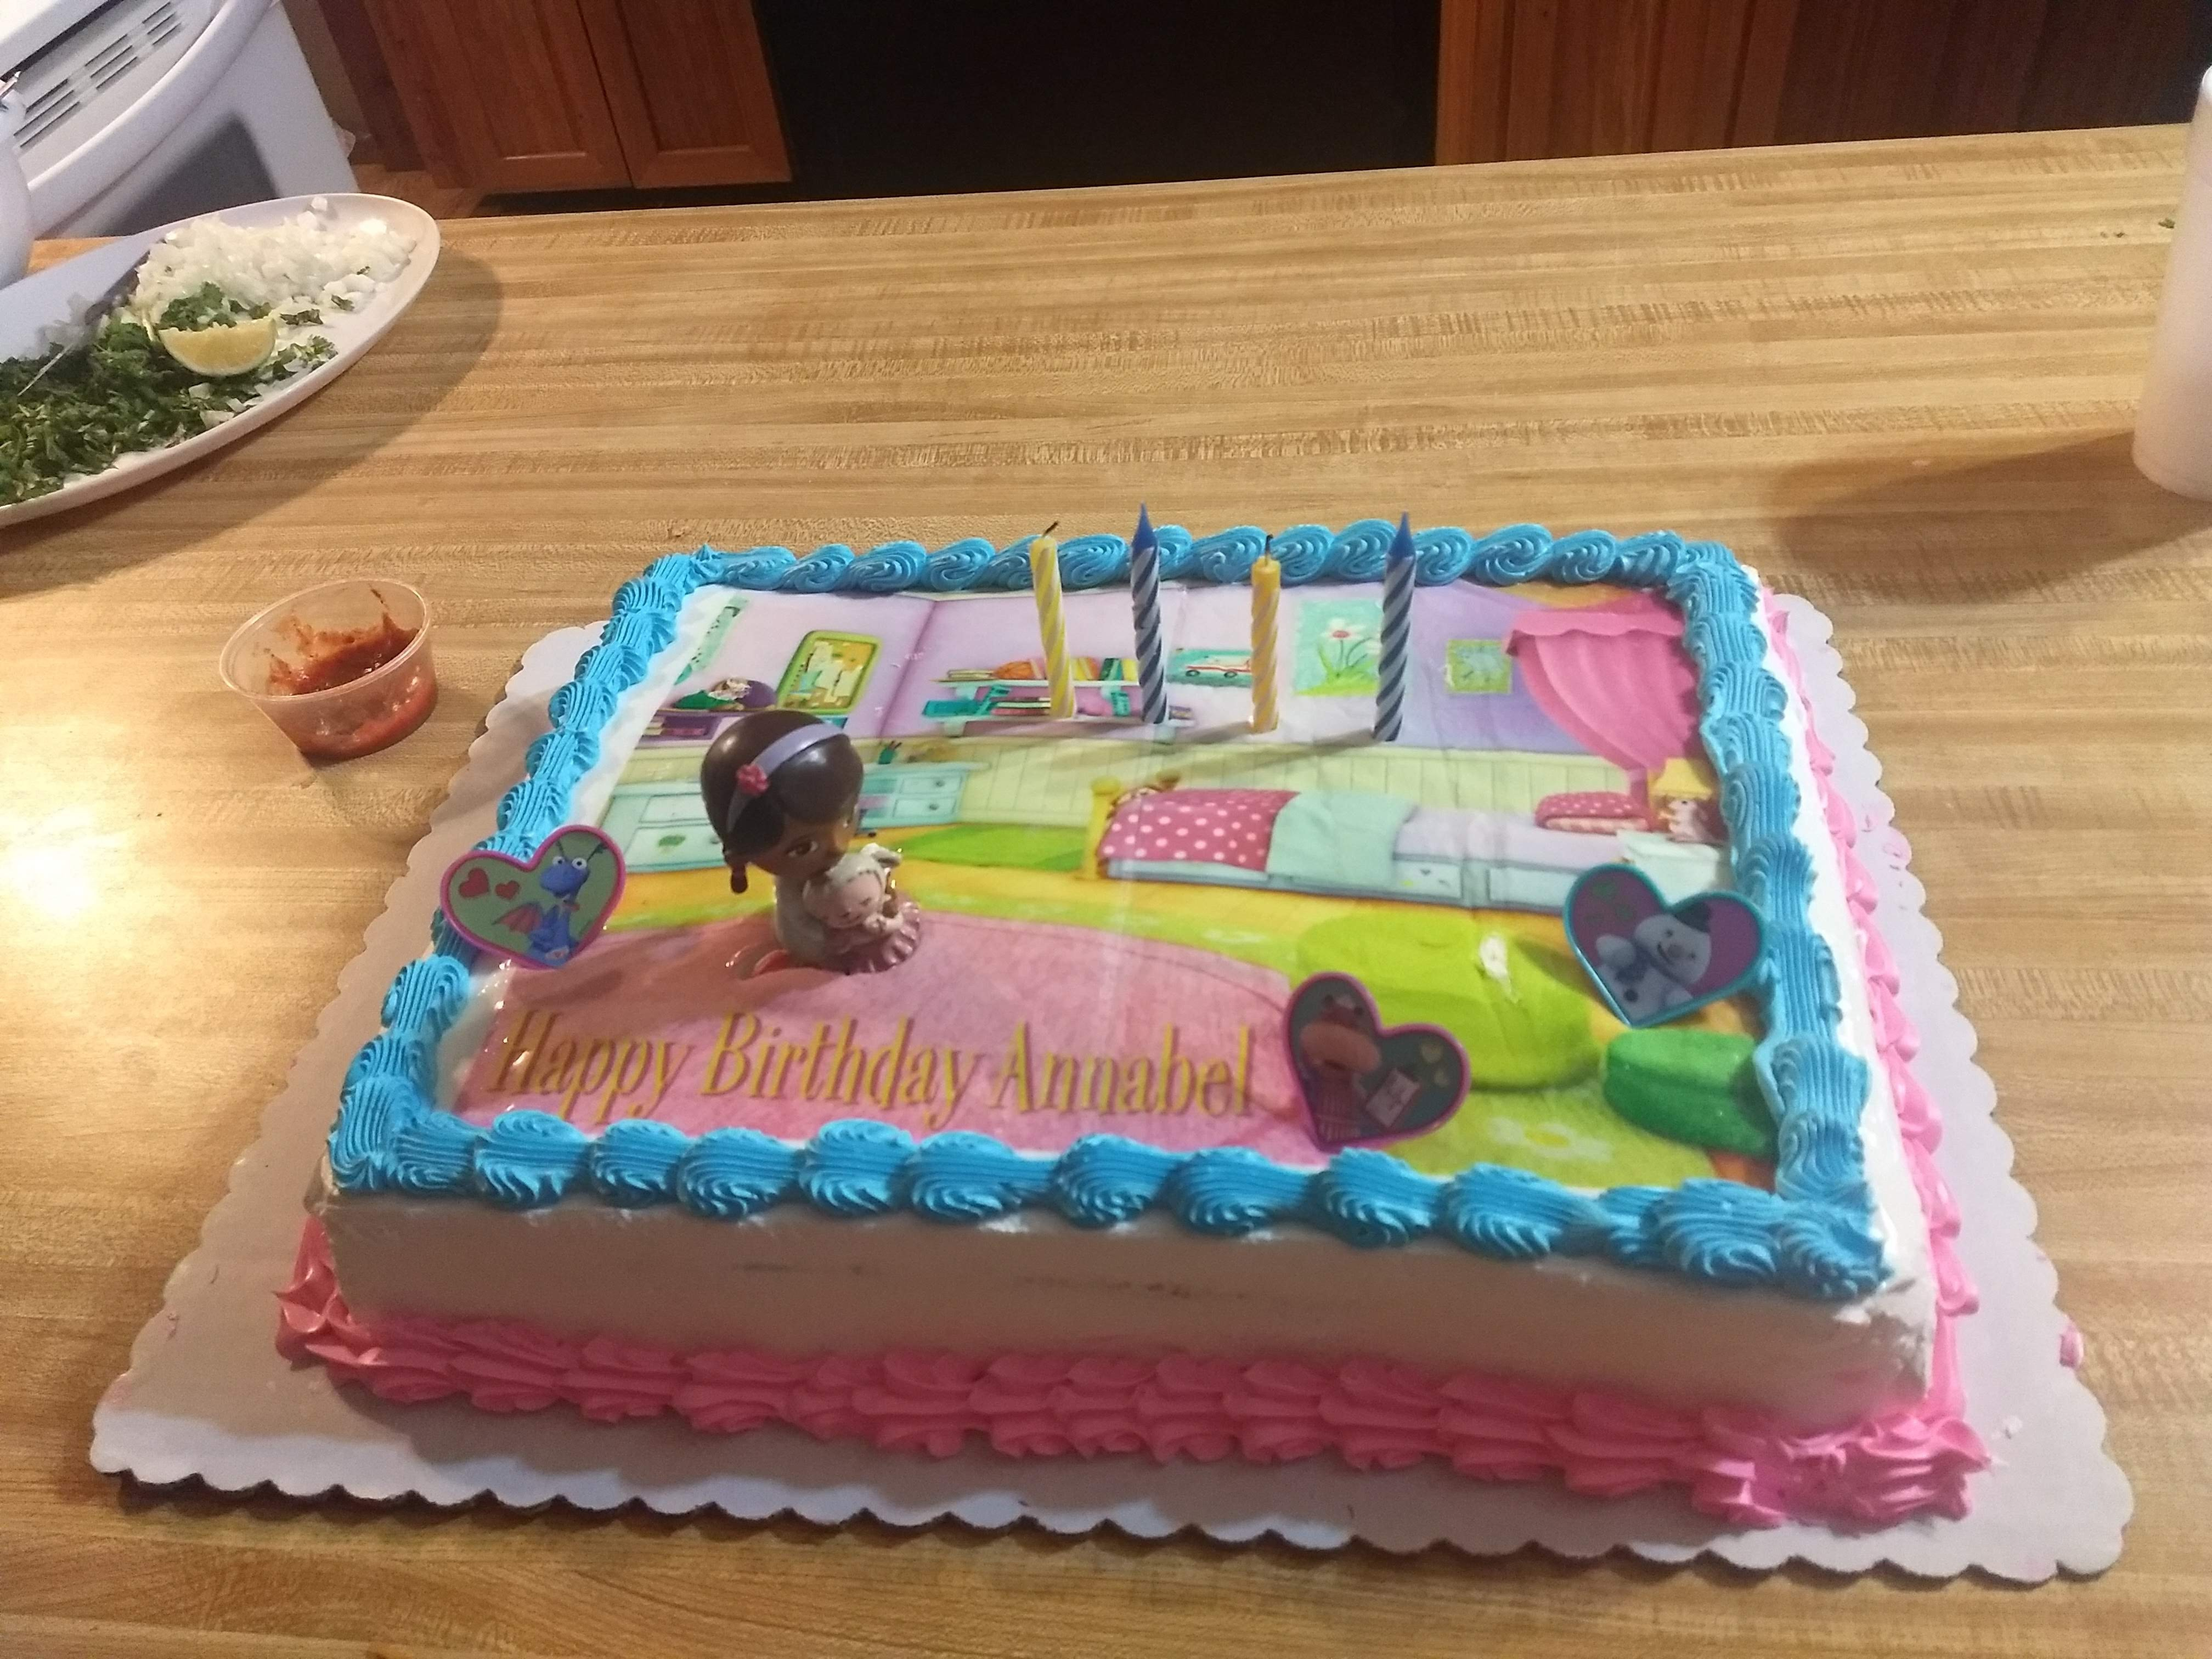 Walmart Bakery Cakes Image Gallery